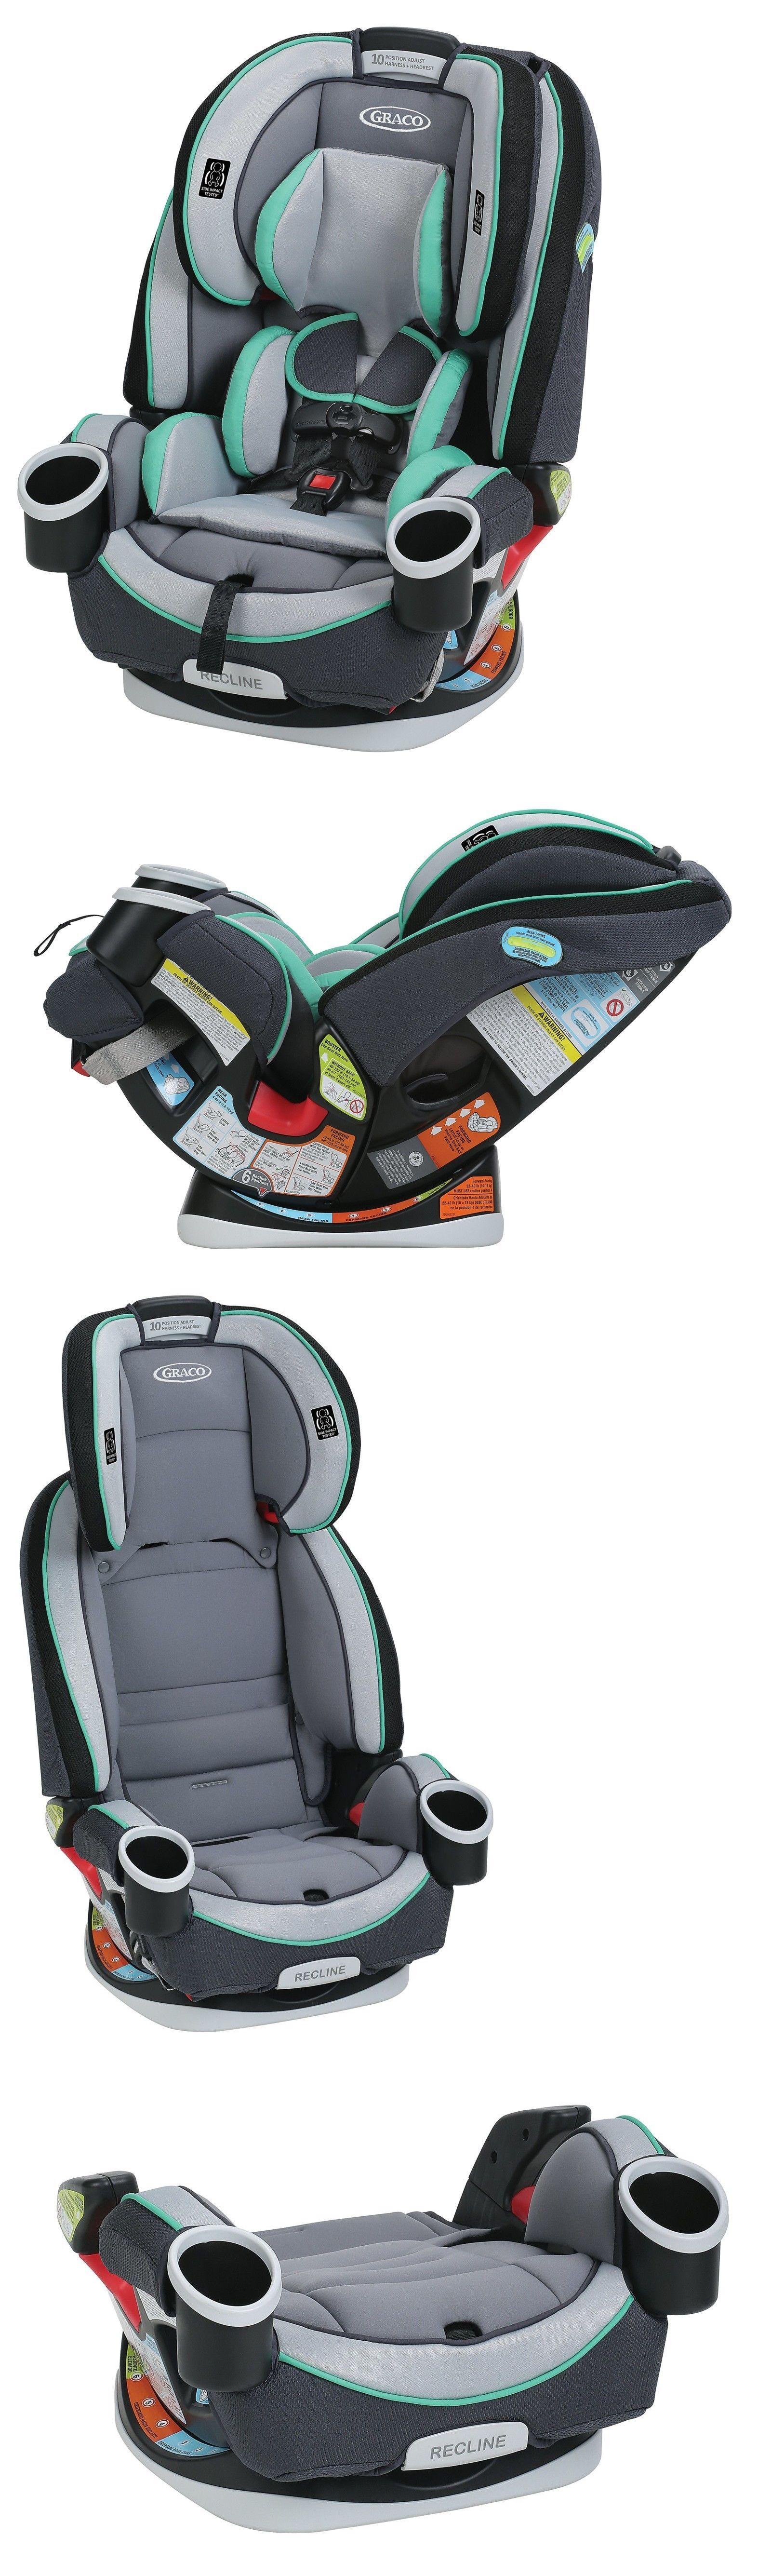 Graco 4Ever 4 In 1 Convertible Car Seat Basin